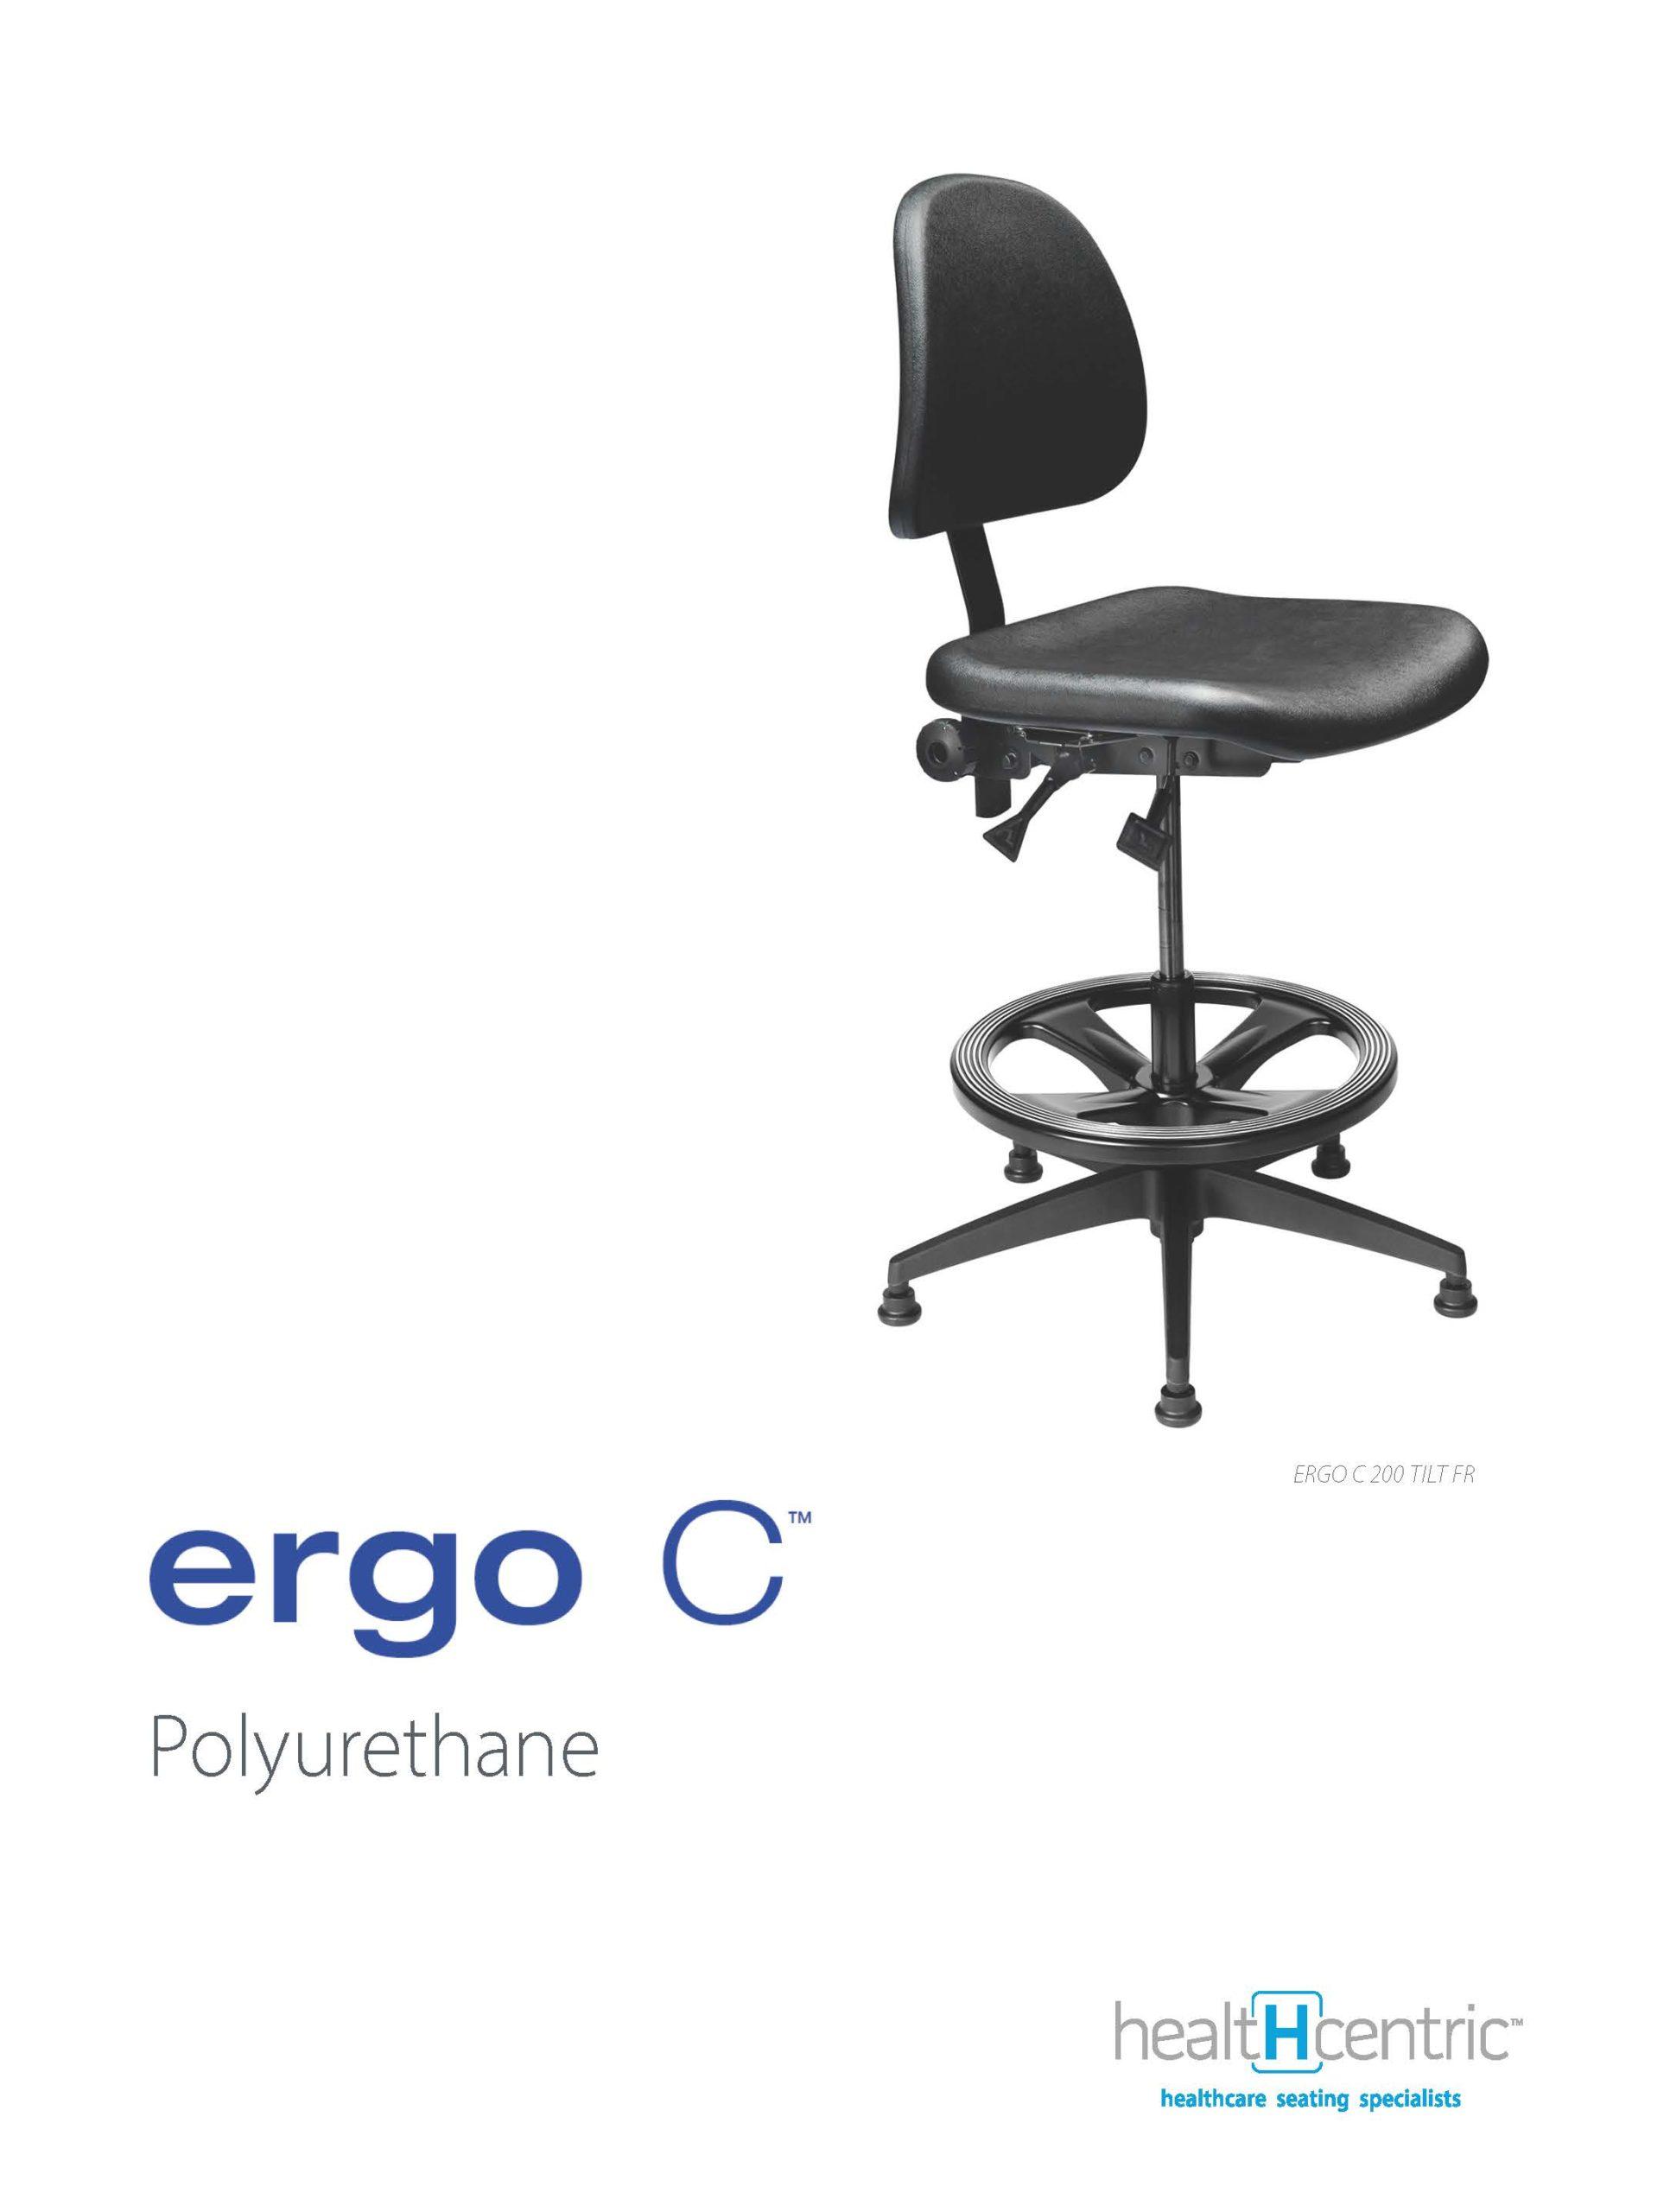 Ergo C Polyurethane